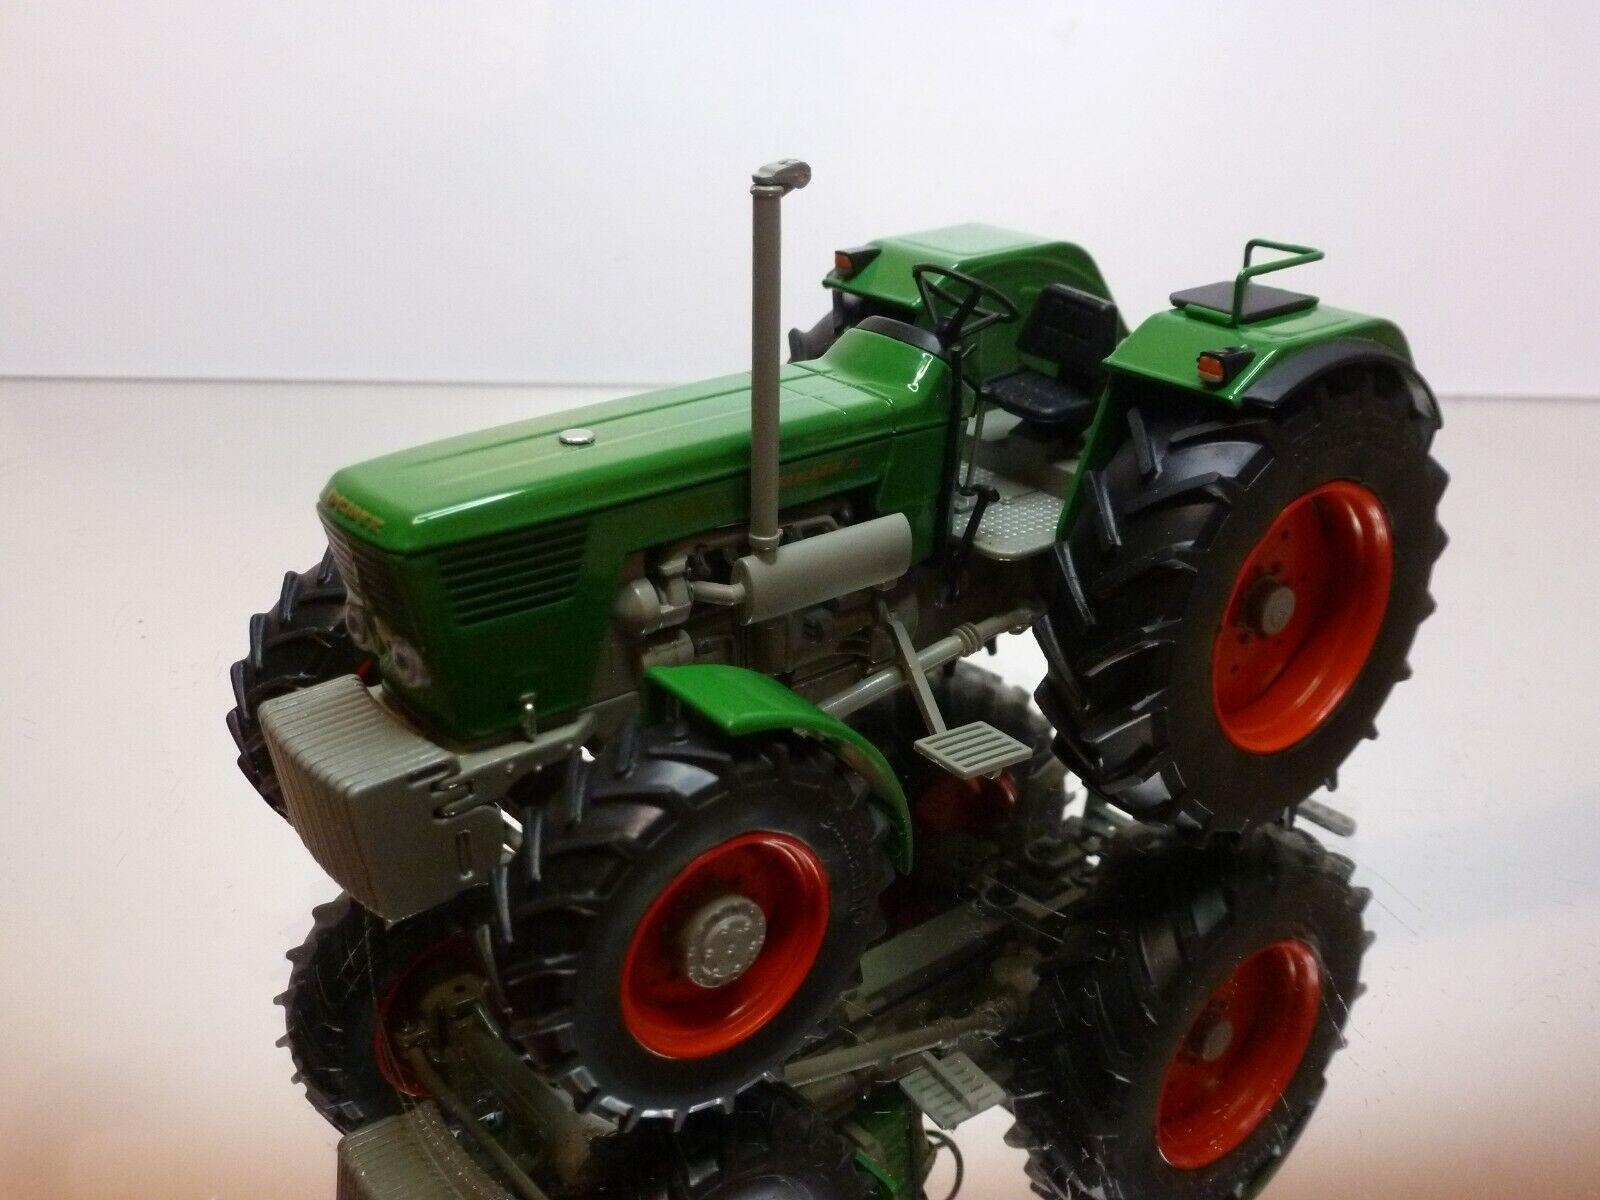 WEISE TOYS DEUTZ D 130 06 TRACTOR - GREEN 1 32 RARE SONDE MODEL - VERY GOOD